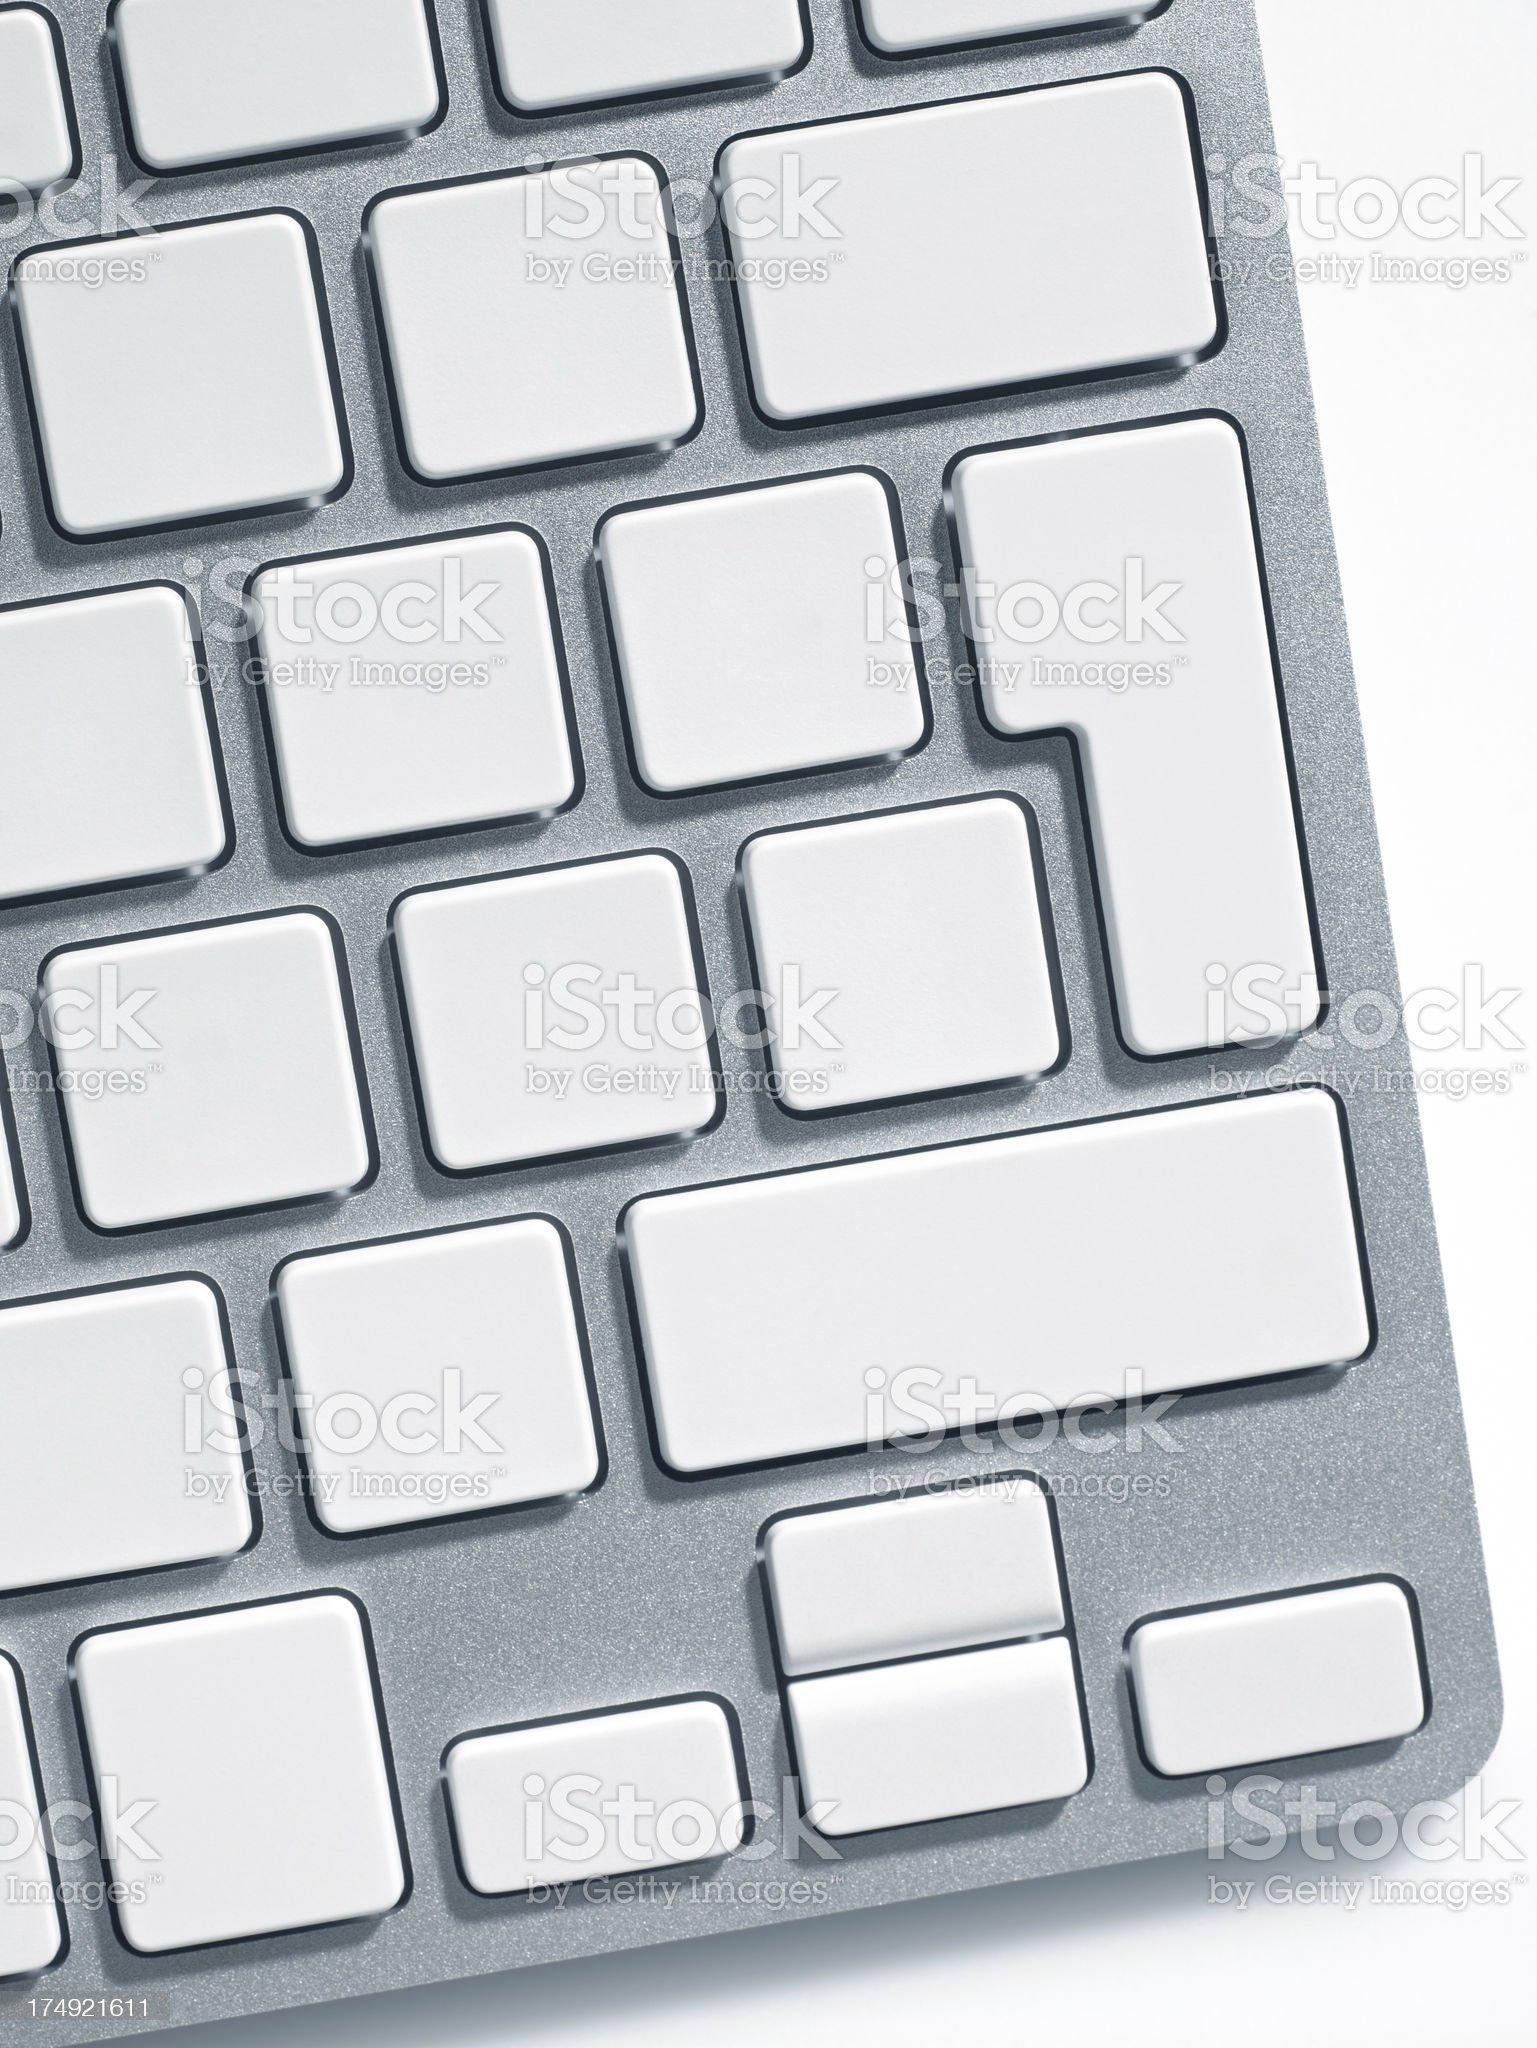 Wireless keyboard royalty-free stock photo